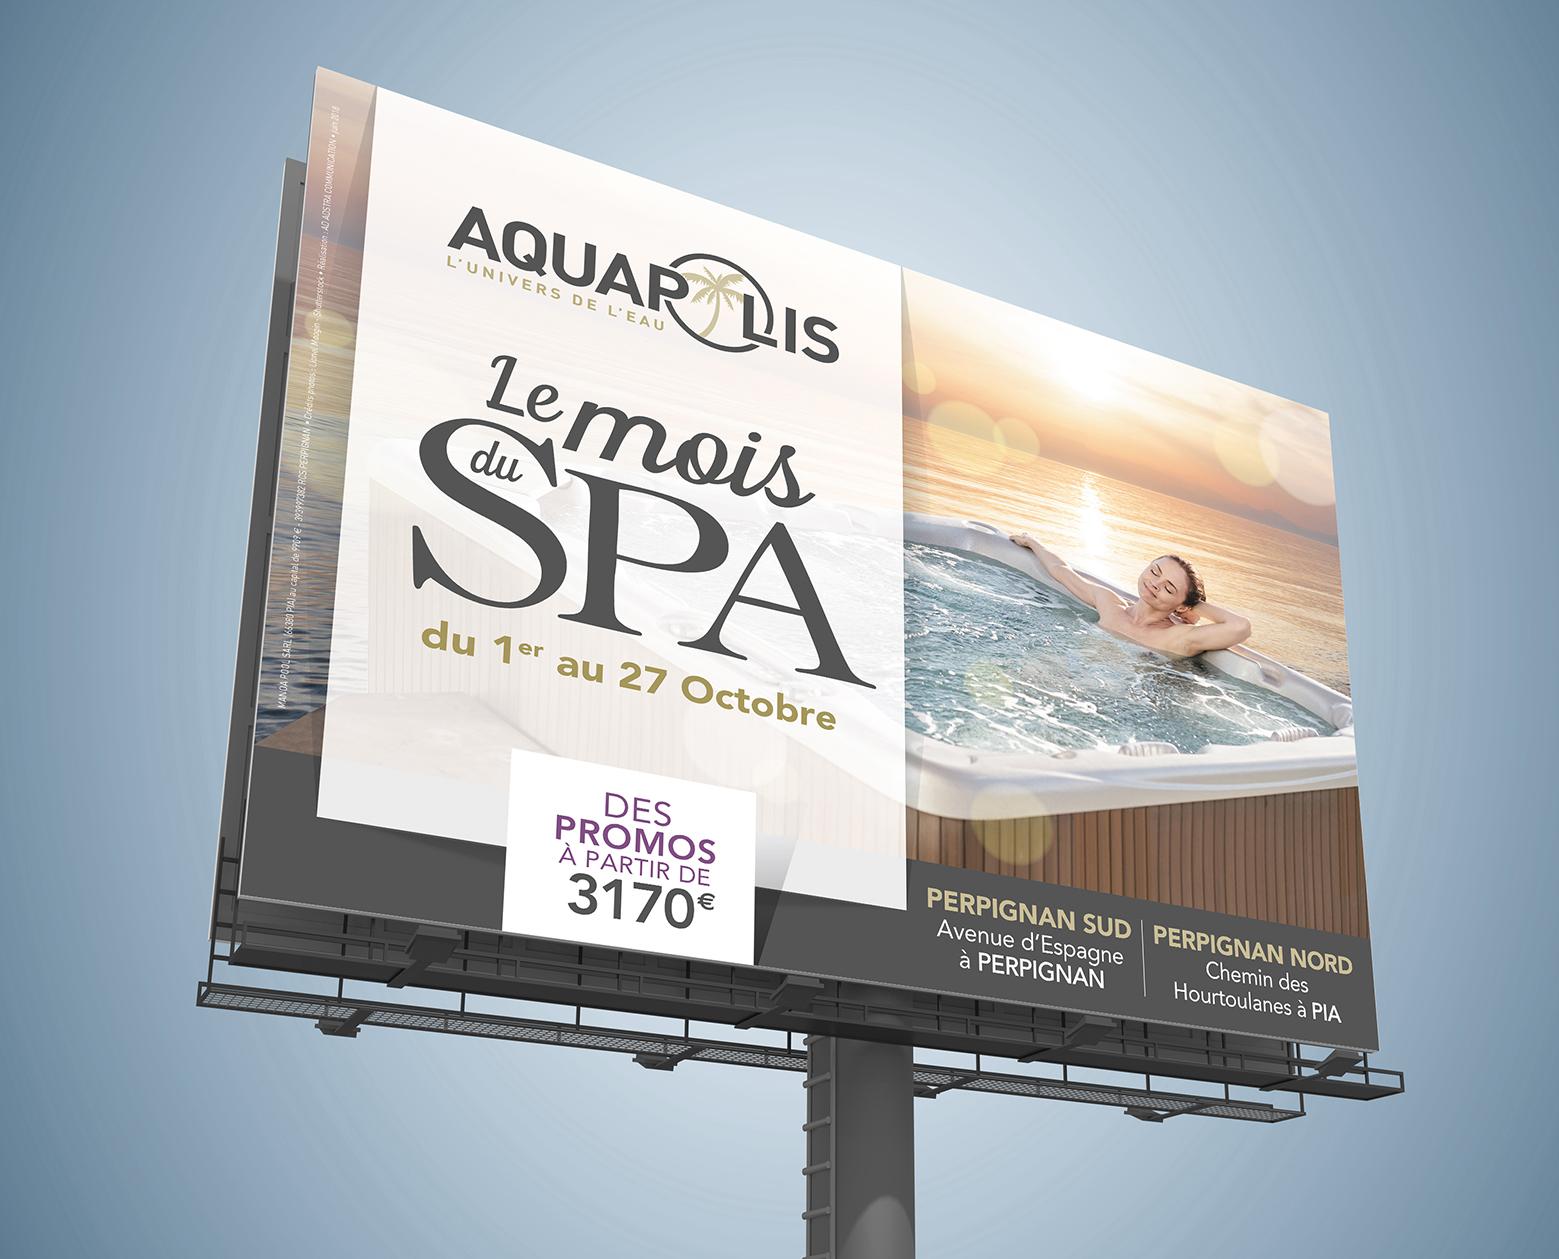 image-aquapolis-spa-automne.jpg